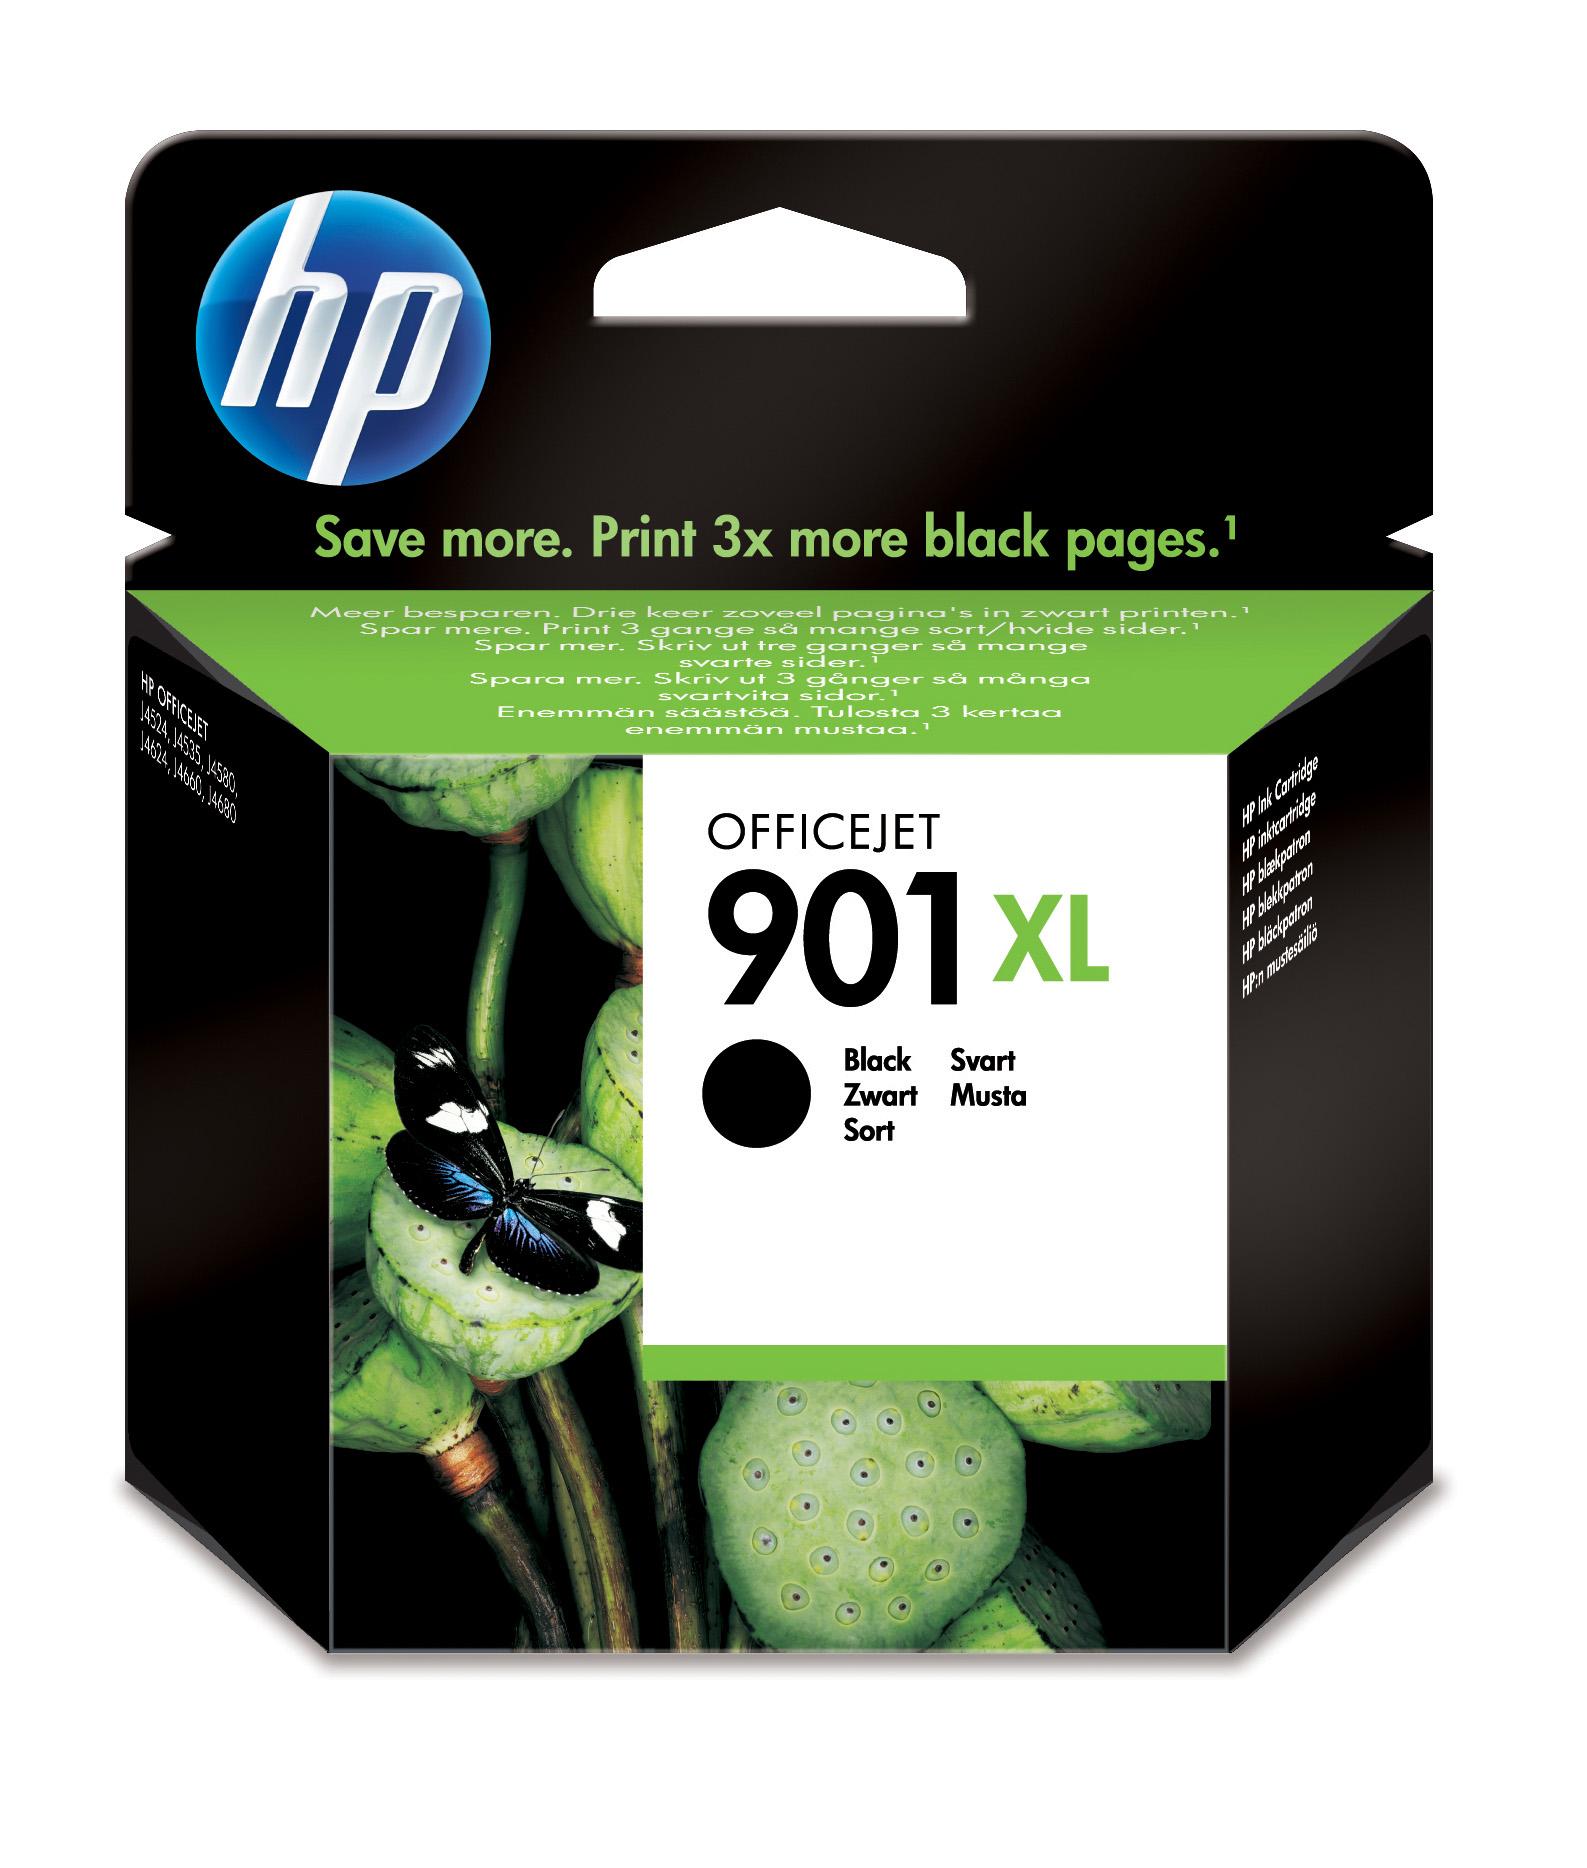 HP 901XL Black Officejet Ink Cartridge Original Negro 1 pieza(s)